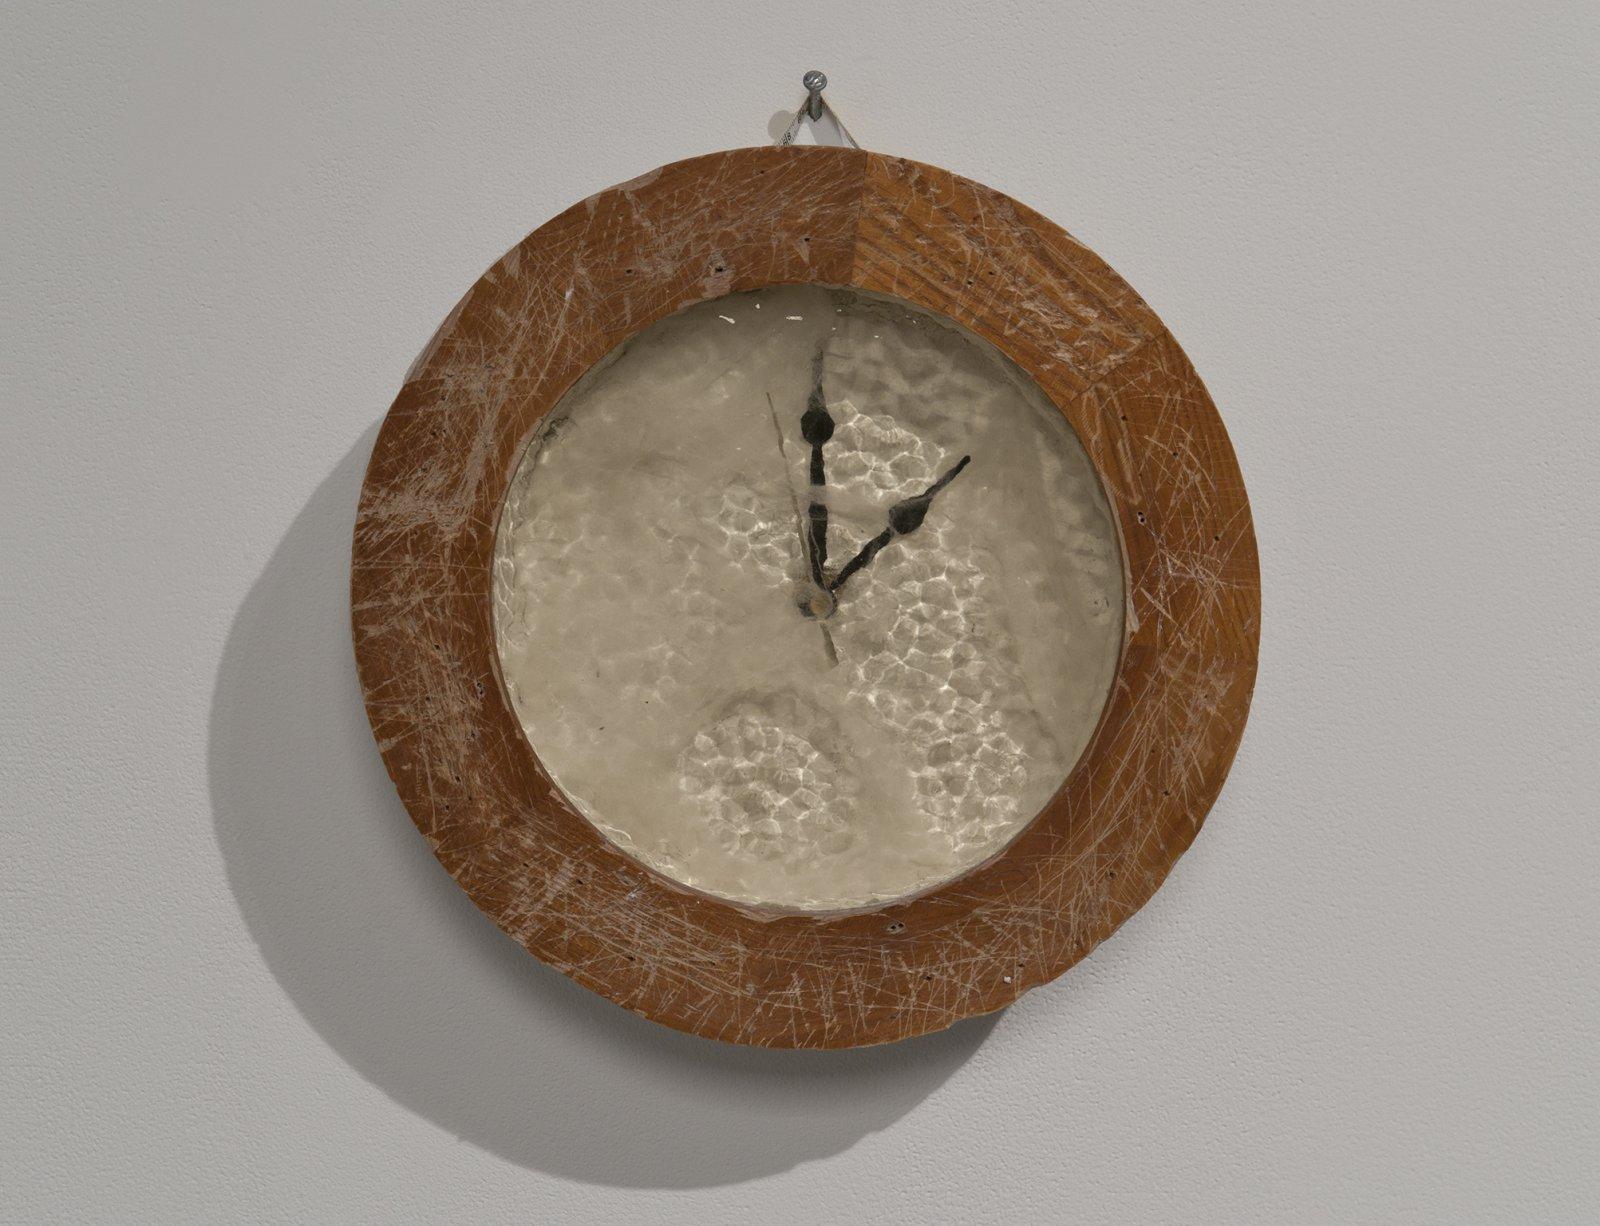 Julia Feyrer, Antiqued/Muffled (The Crypt), 2012, English Muffle Antique Veil Glass, wood, fake cobwebs, styrofoam, plaster, plastic clock hands, mothball, tape measure, quartz clock movement, 13 diameter x 3 in. (32 diameter x 8 cm) by Julia Feyrer